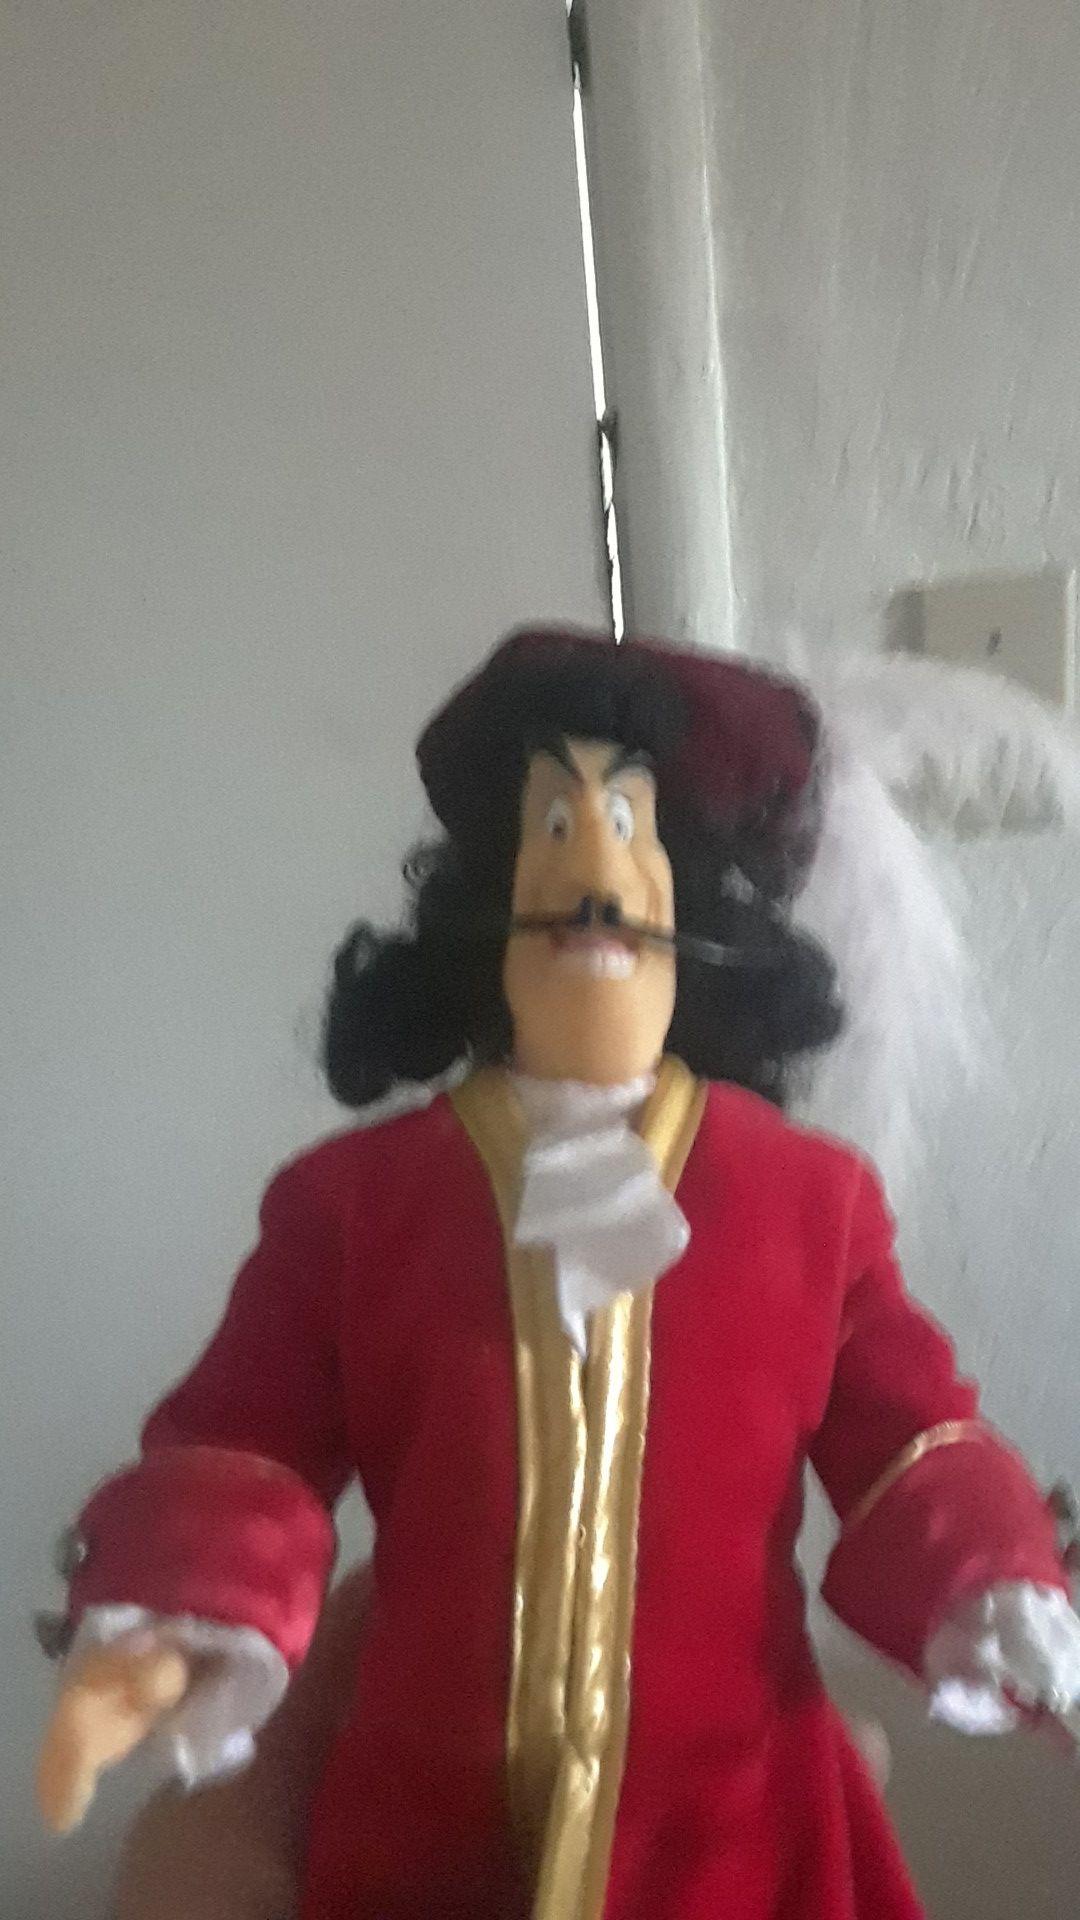 Disney Captain Hook doll